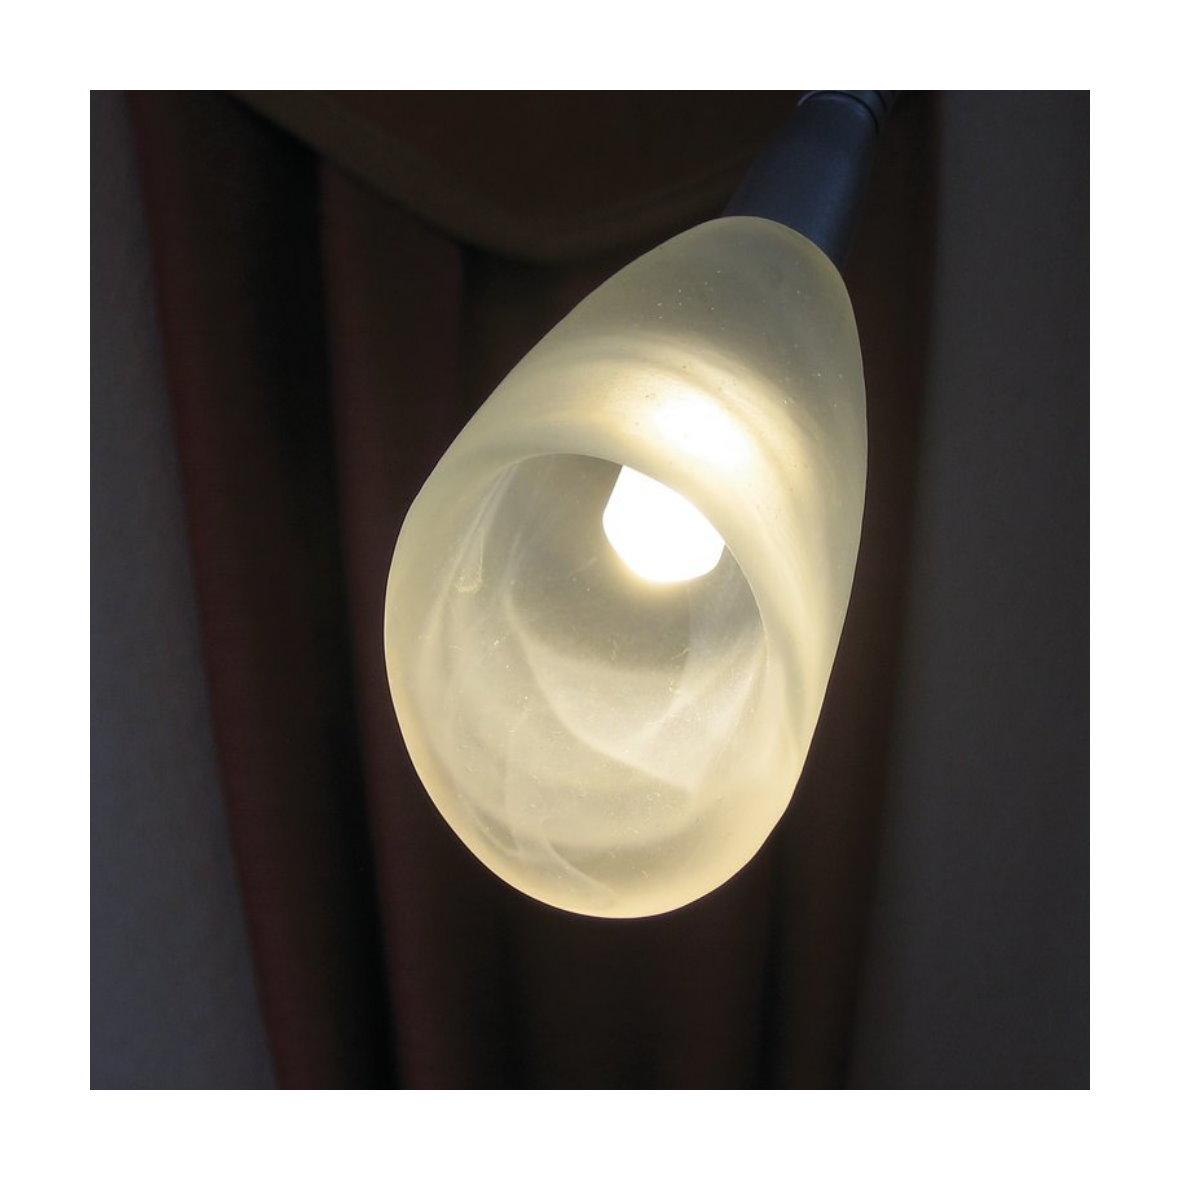 led lampe austauschen inspirierendes design f r wohnm bel. Black Bedroom Furniture Sets. Home Design Ideas